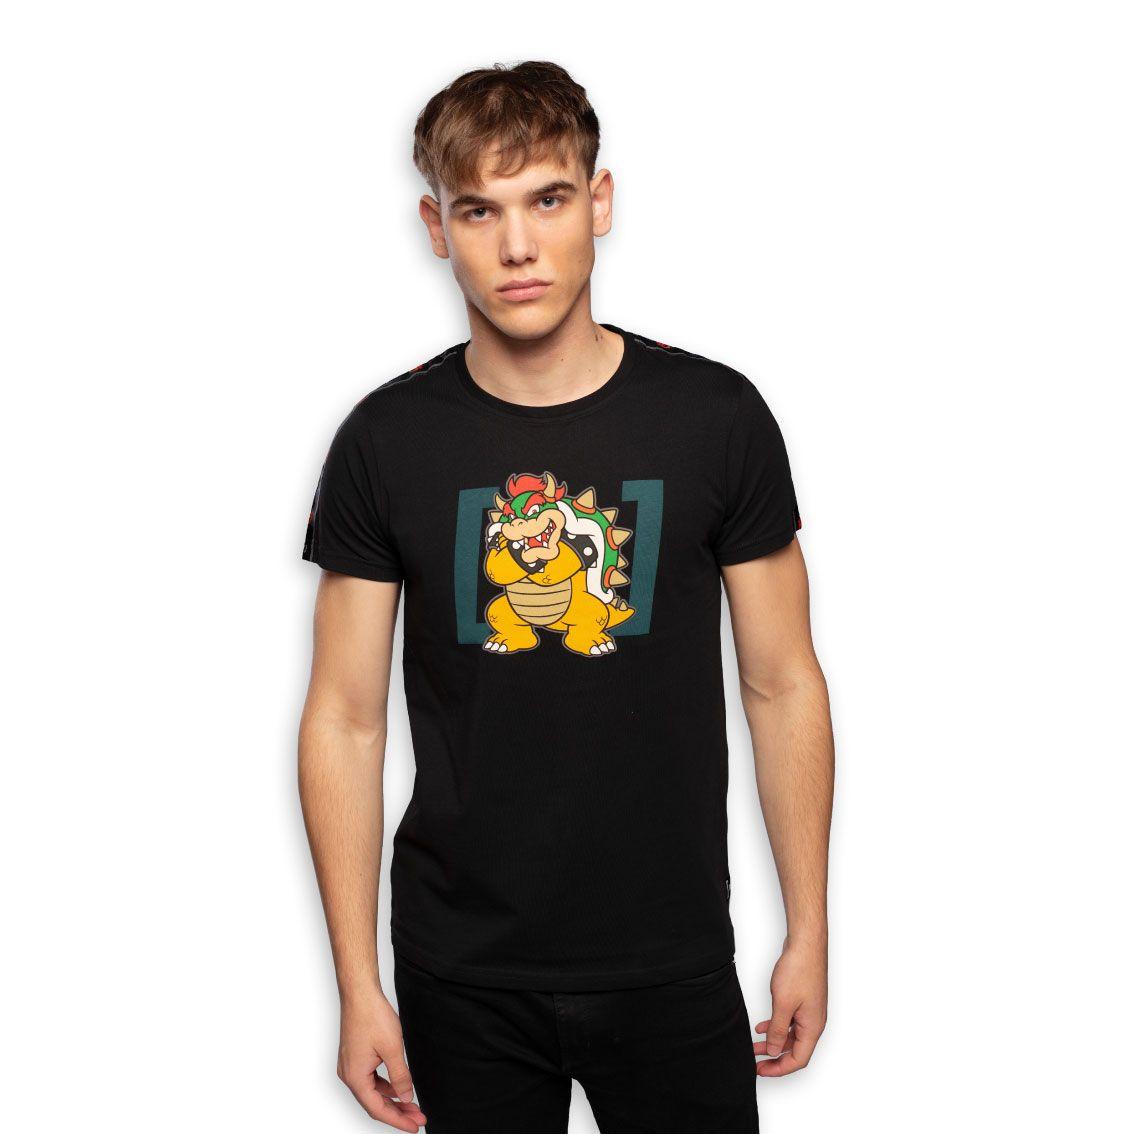 T-shirt homme super mario bowser (photo)